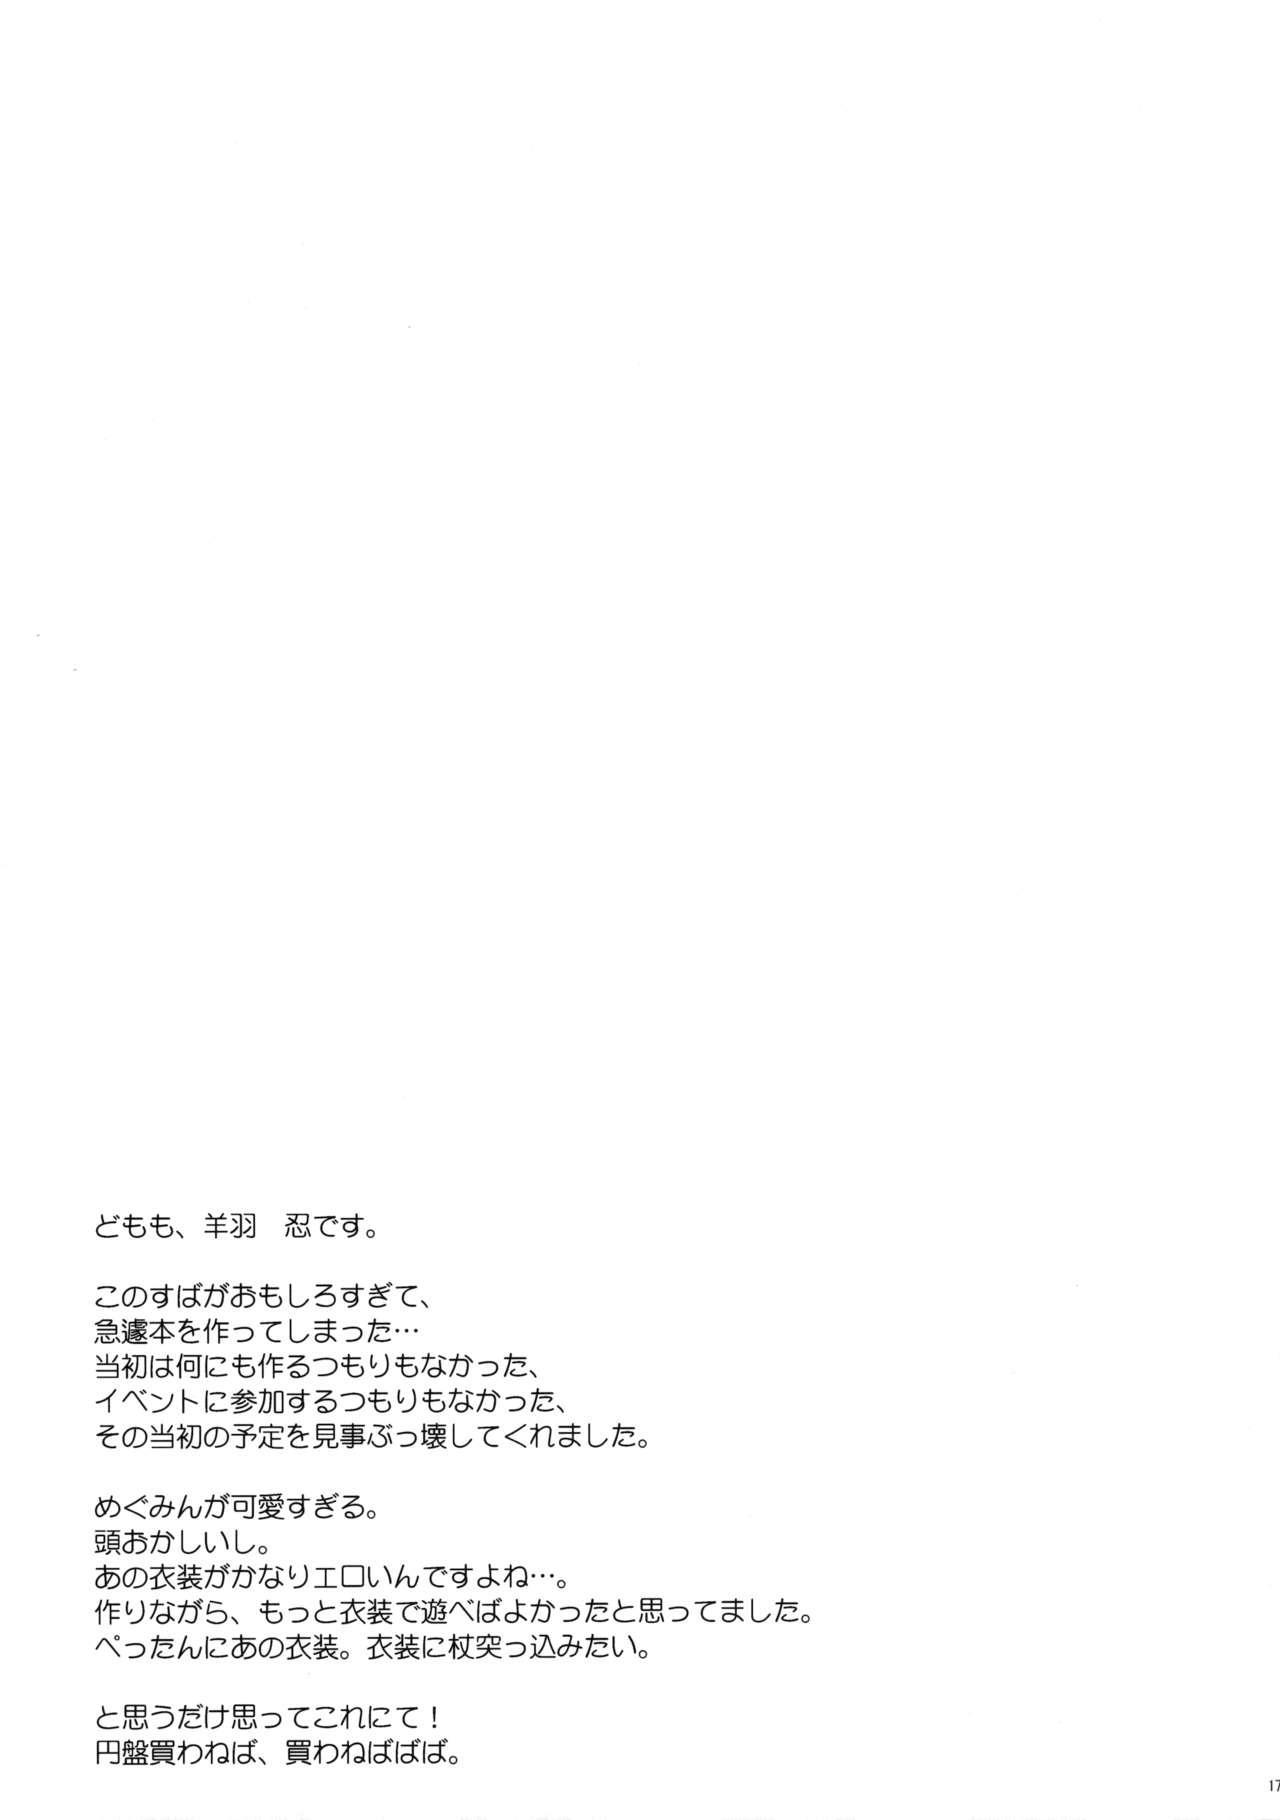 Kono Megumin ni Sainan o!   Disaster Upon This Megumin! 14